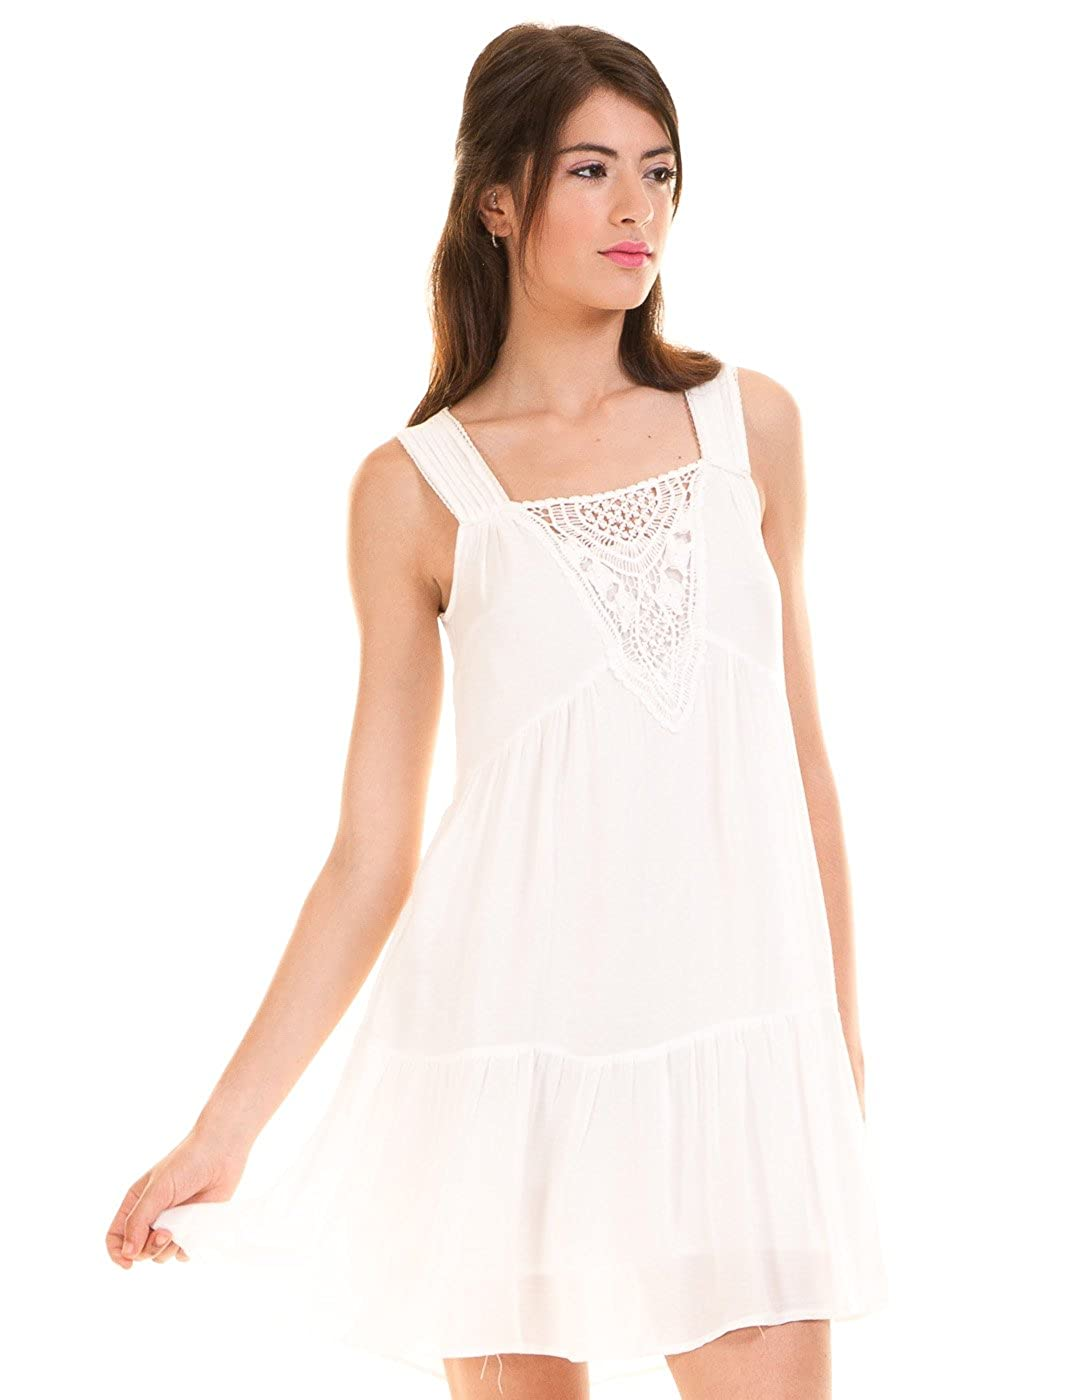 Vestidos de novia ibicencos amazon